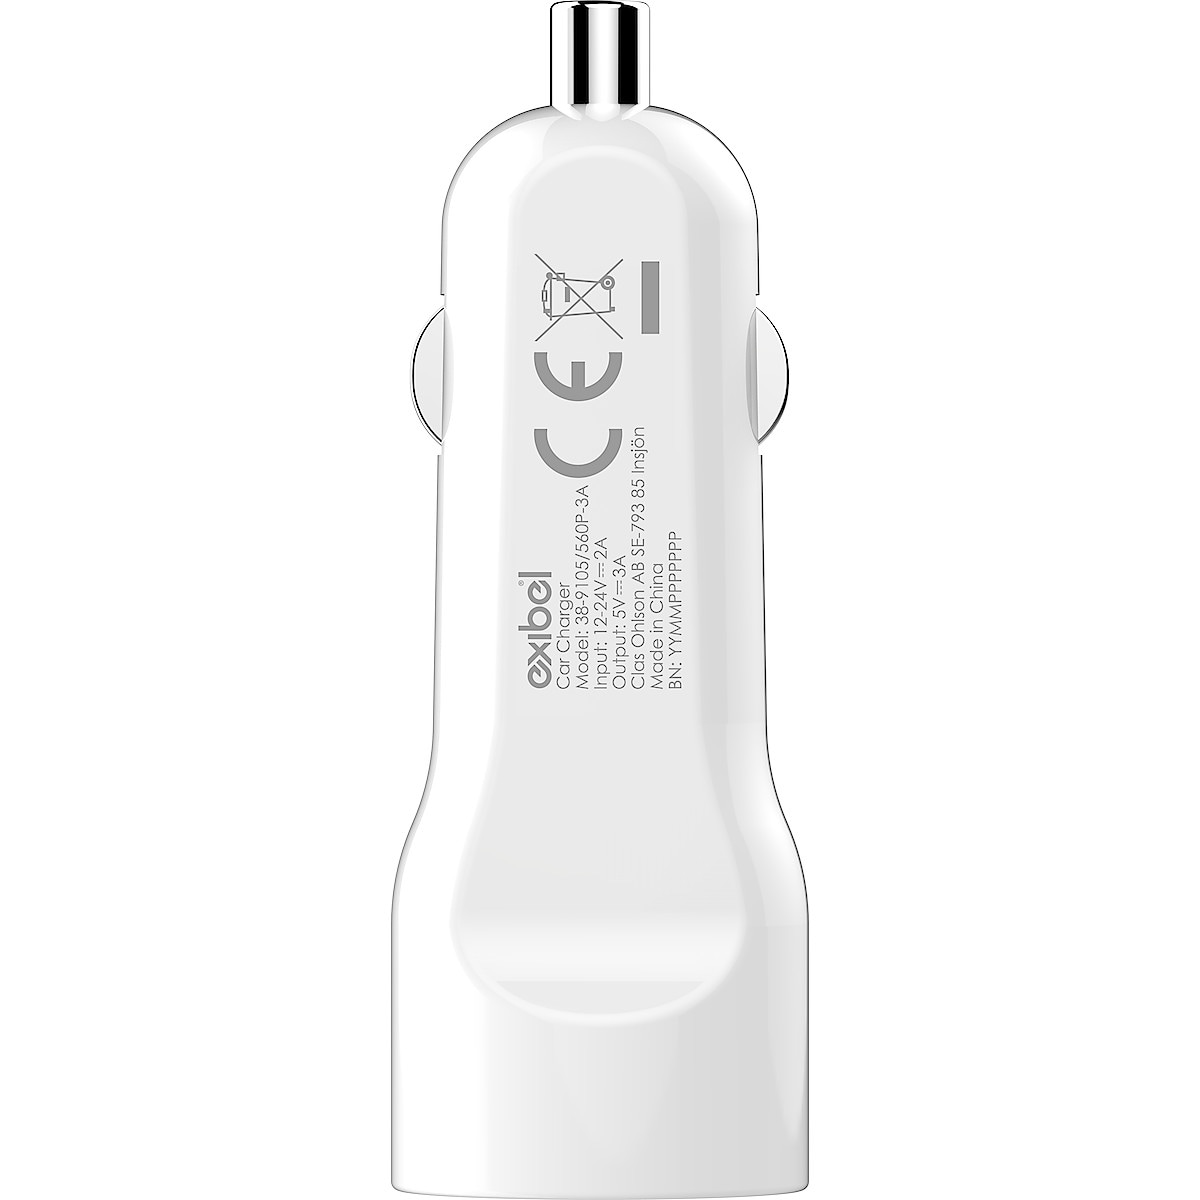 12 V-laddare USB-C Exibel